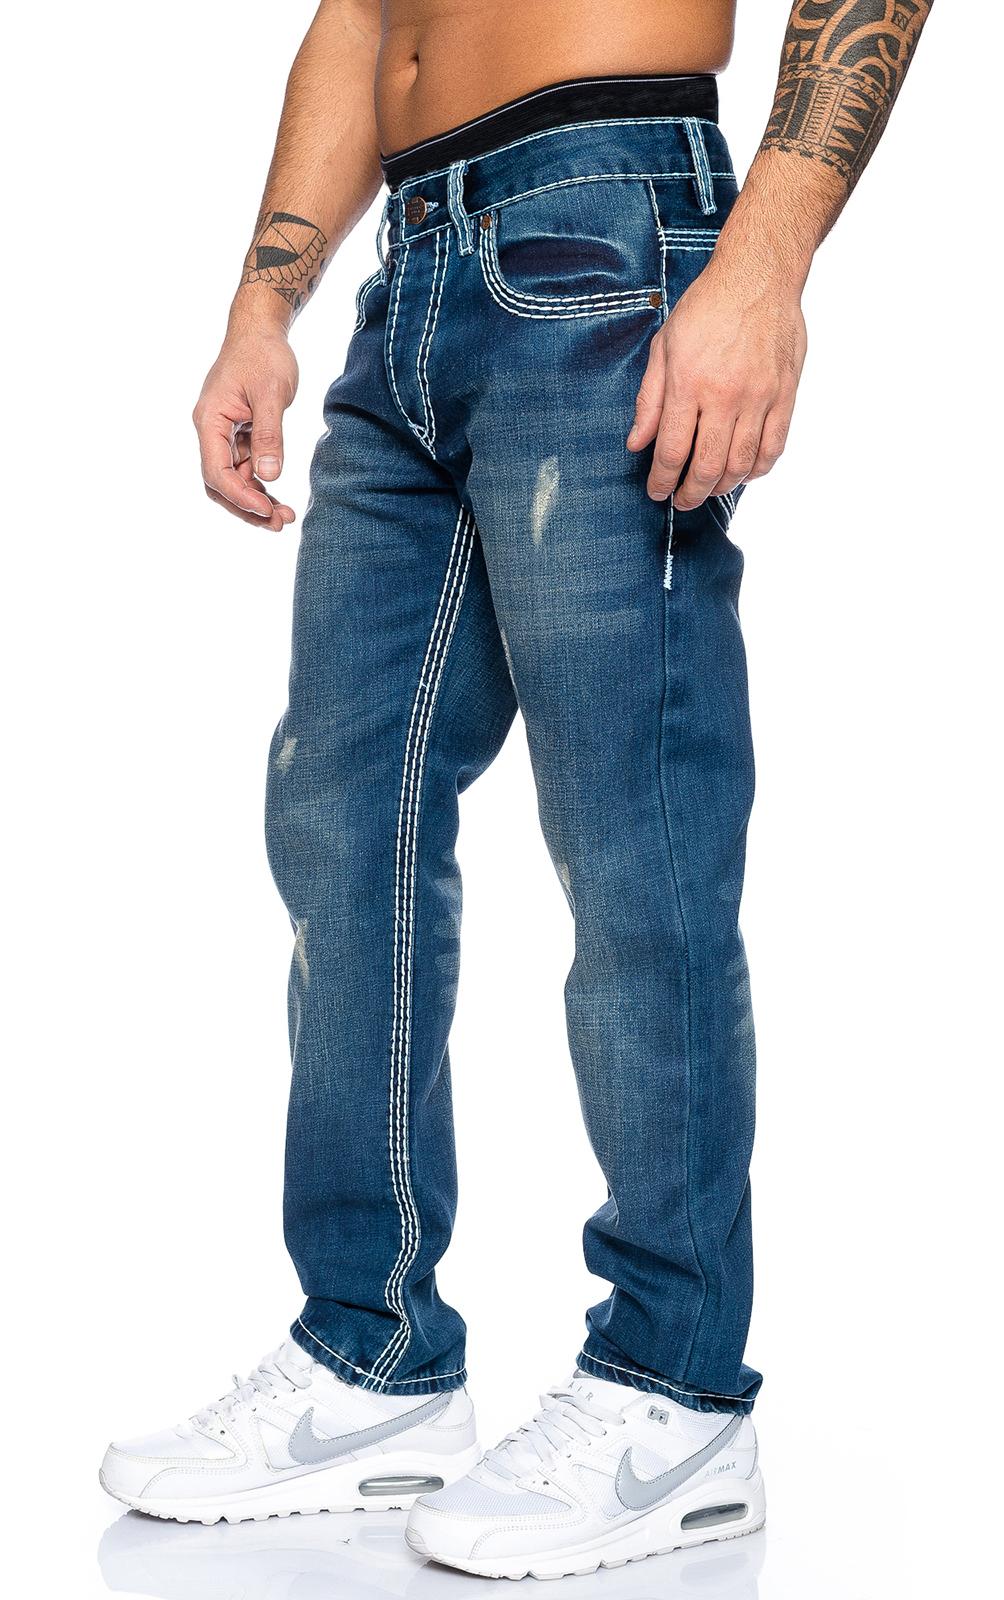 rock creek designer herren jeans hose wei e zier n hte denim rc 2084 w29 w44 ebay. Black Bedroom Furniture Sets. Home Design Ideas